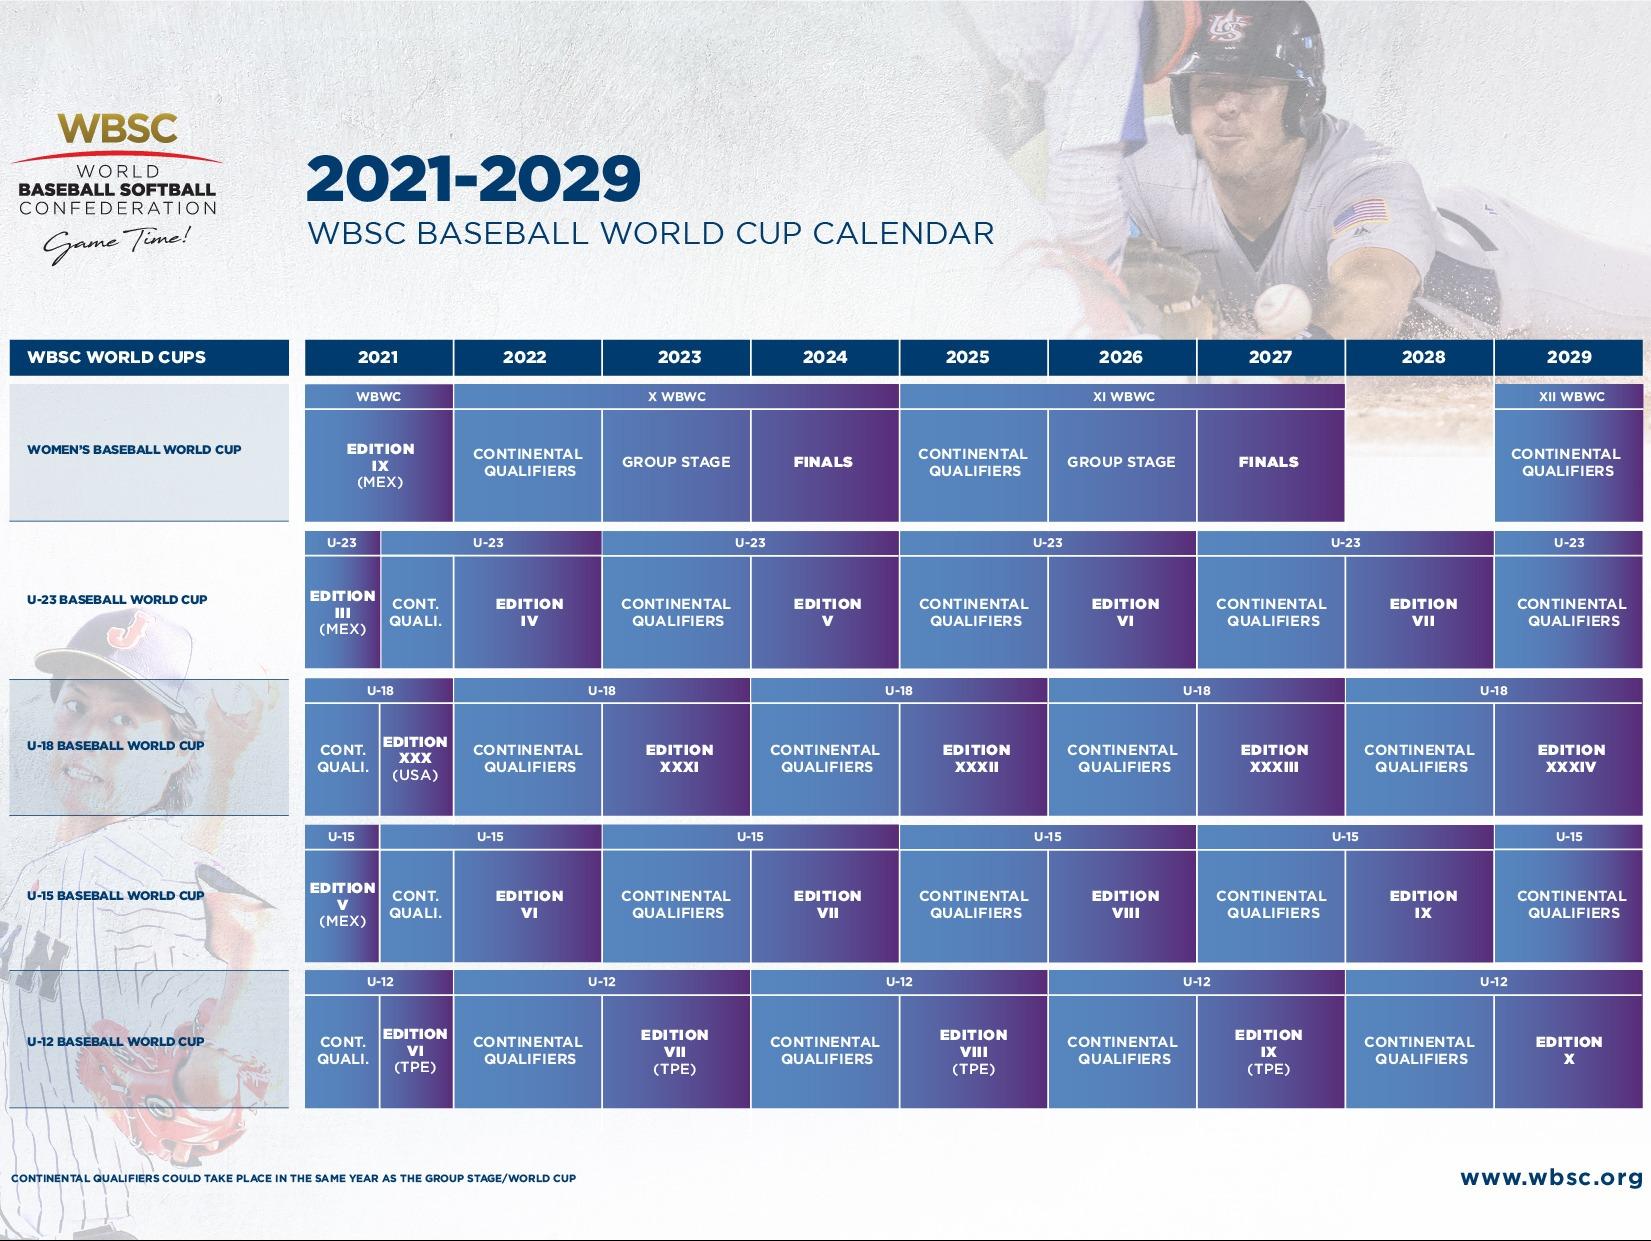 Calendrier Coupe Du Monde Feminine 2022 Pdf WBSC   World Baseball Softball Confederation